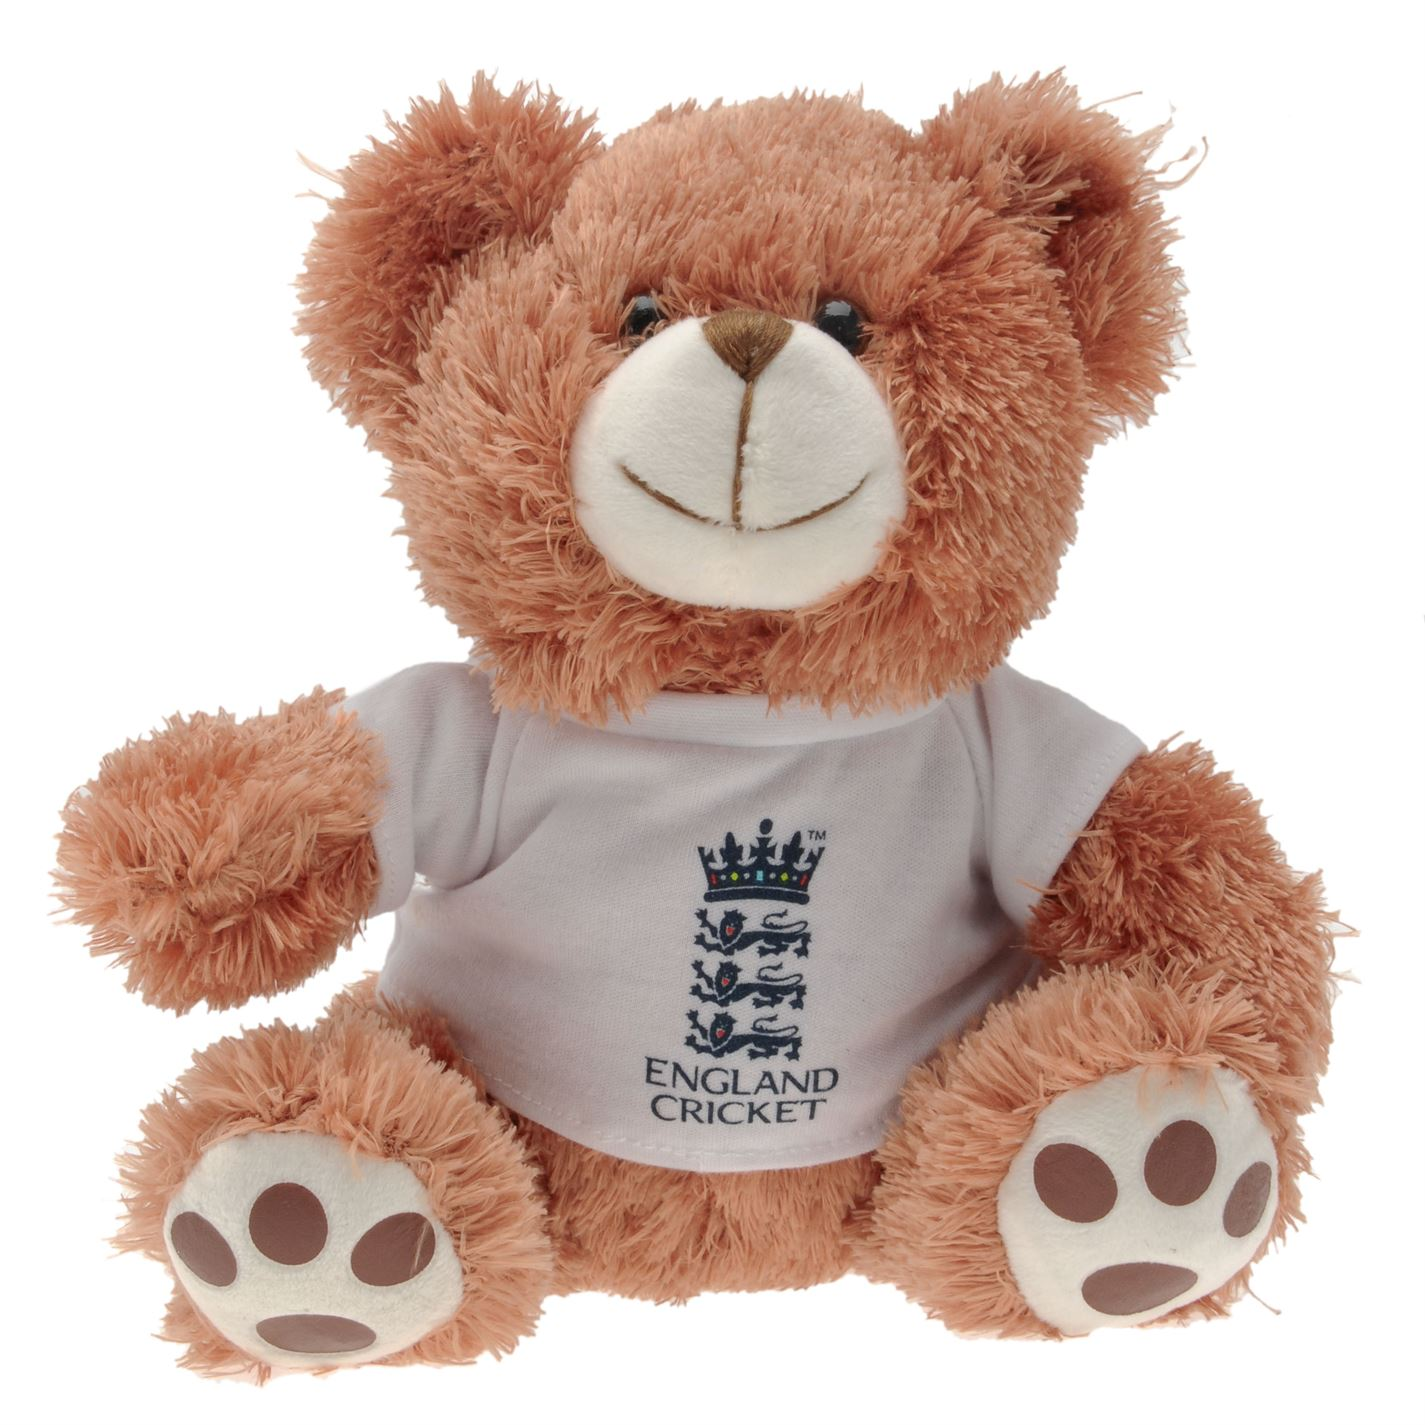 Ursulet Teddy Bear England Cricket Cricket